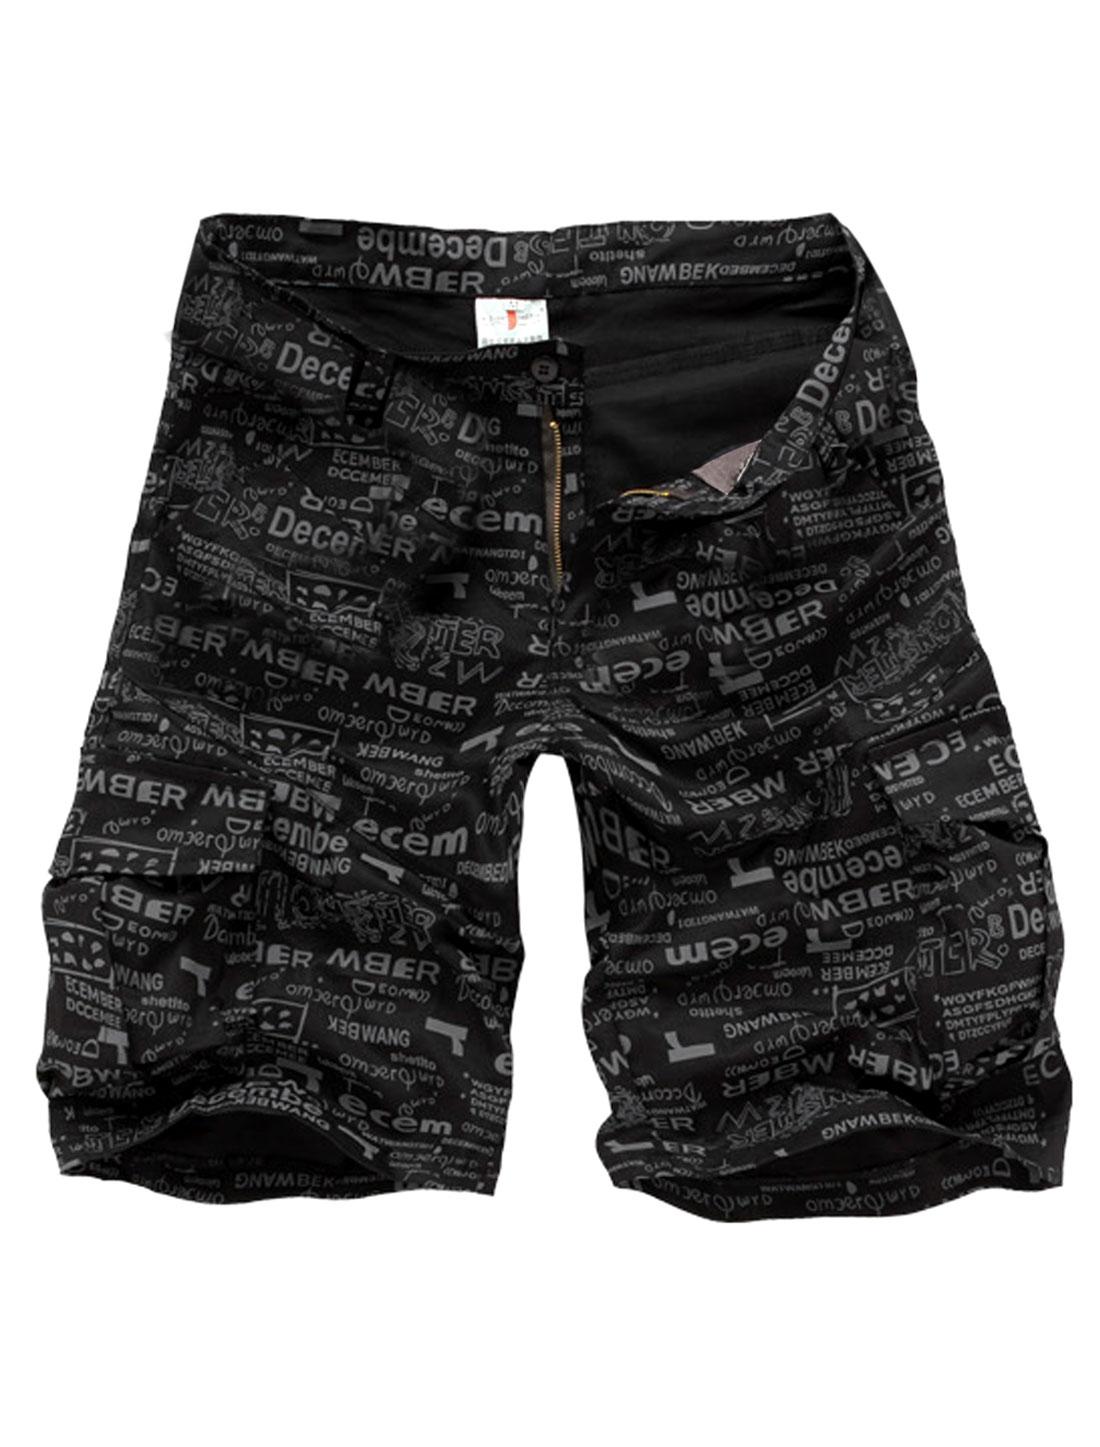 Men Waistband Loop Zip Closure Slant Pockets Letter Prints Hip Pockets Short Pants Black W34